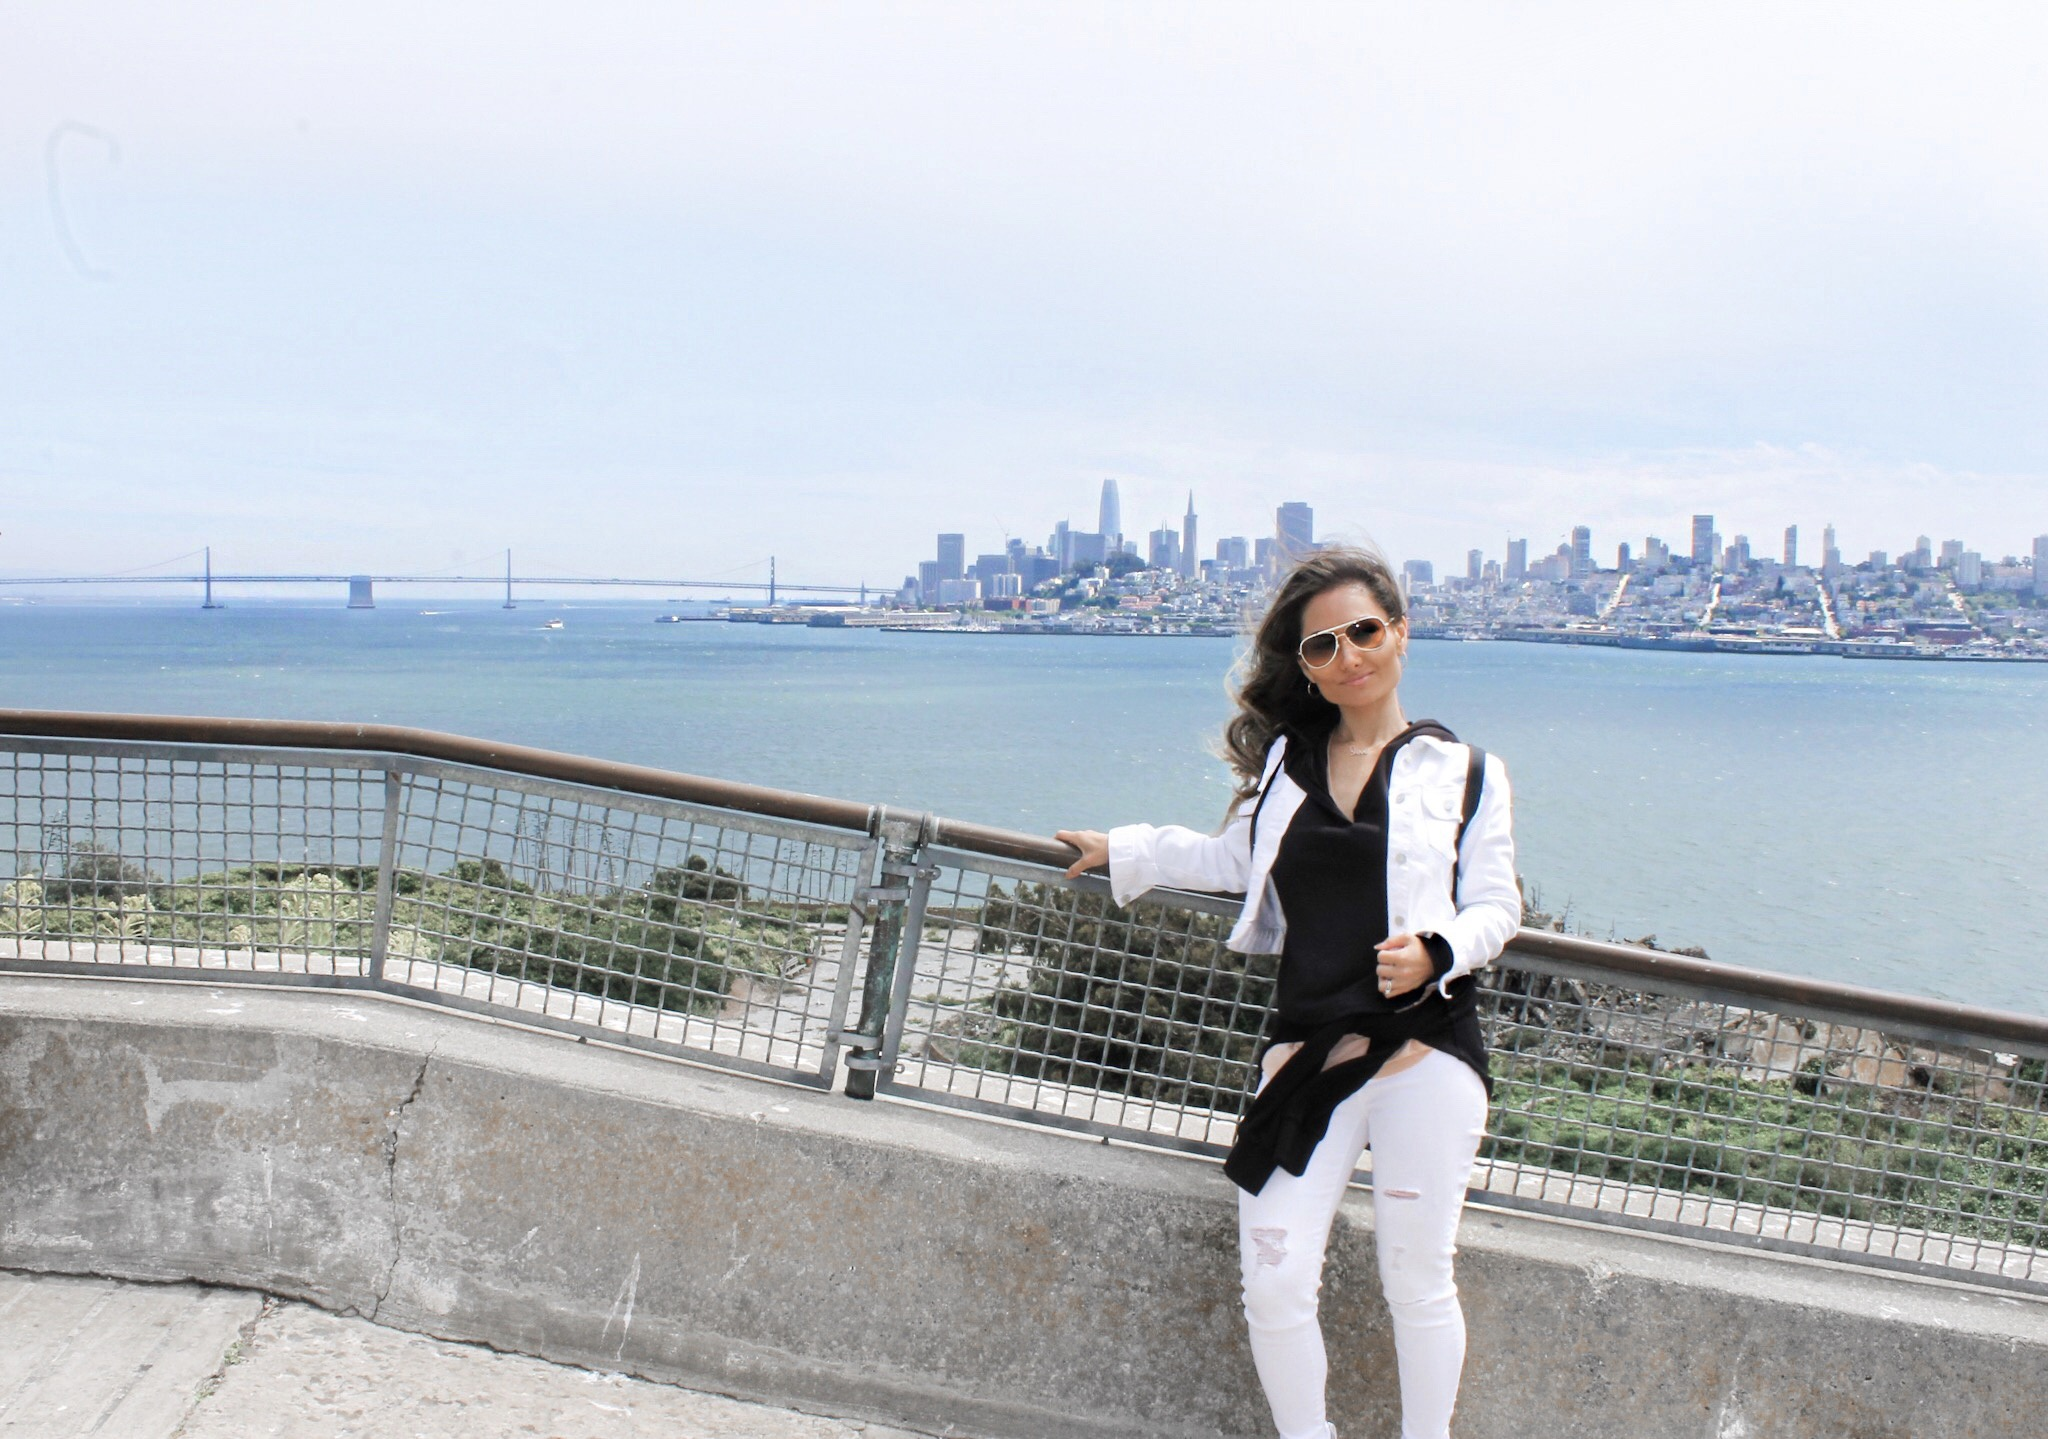 Alcatraz views, Alcatraz beach, Alcatraz Island, Alcatraz tour, Alcatraz history